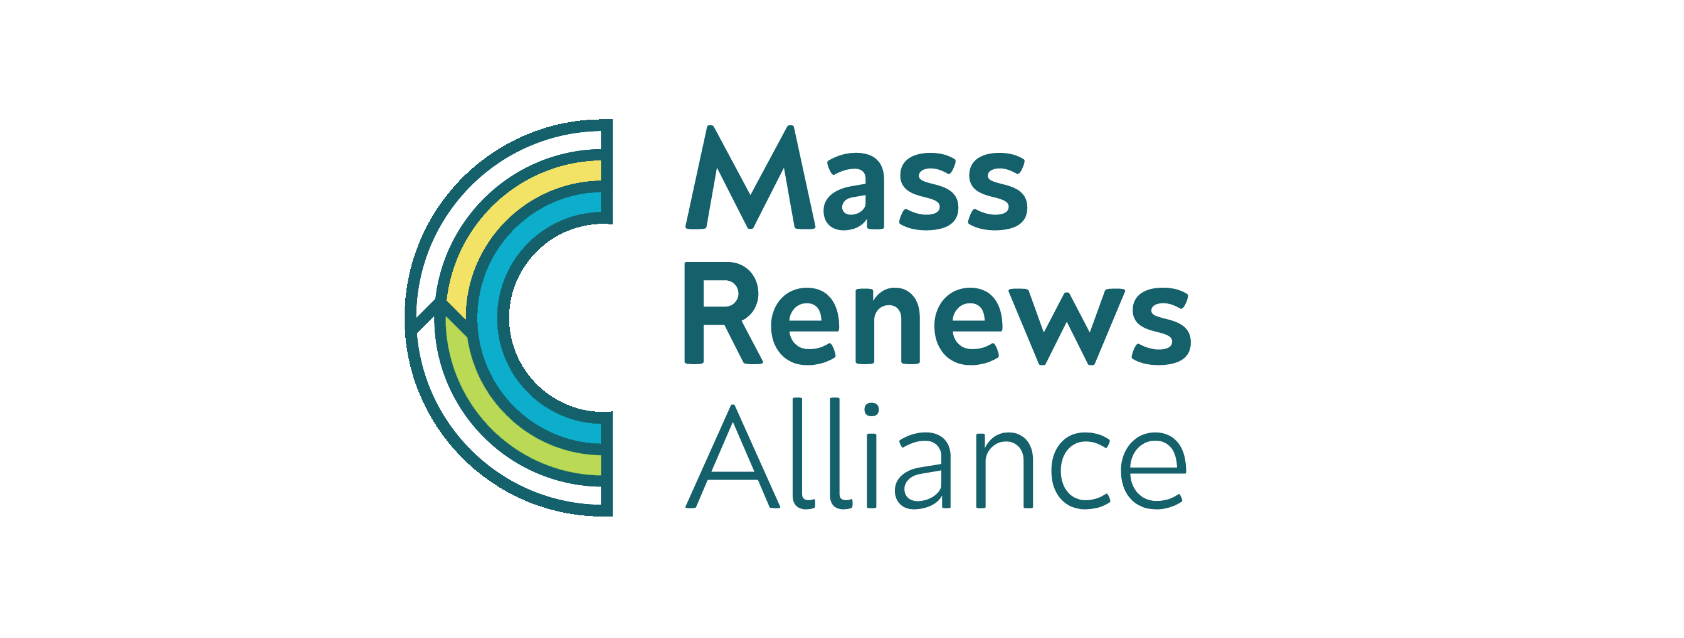 Mass Renews Alliance image